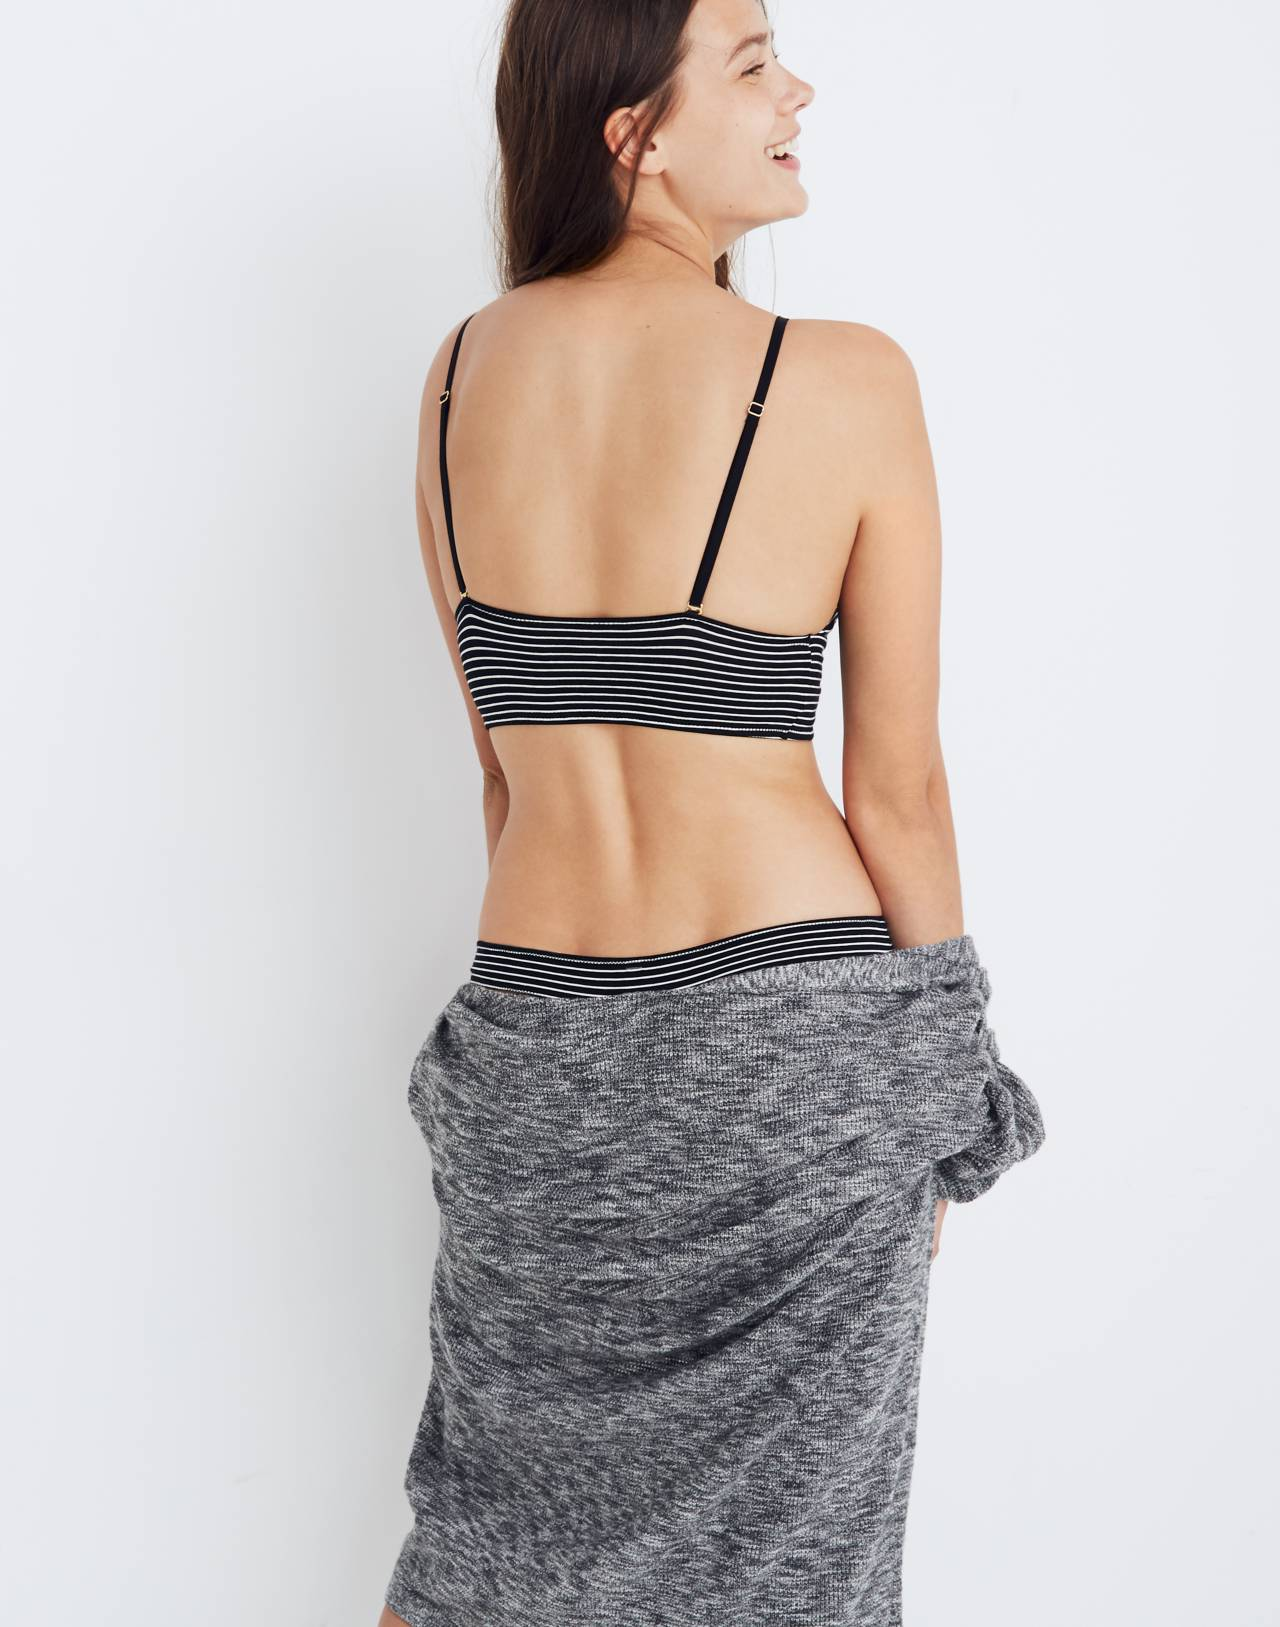 Cotton-Modal® Kealy Longline Bralette in Stripe-Mix in bright ivory image 3